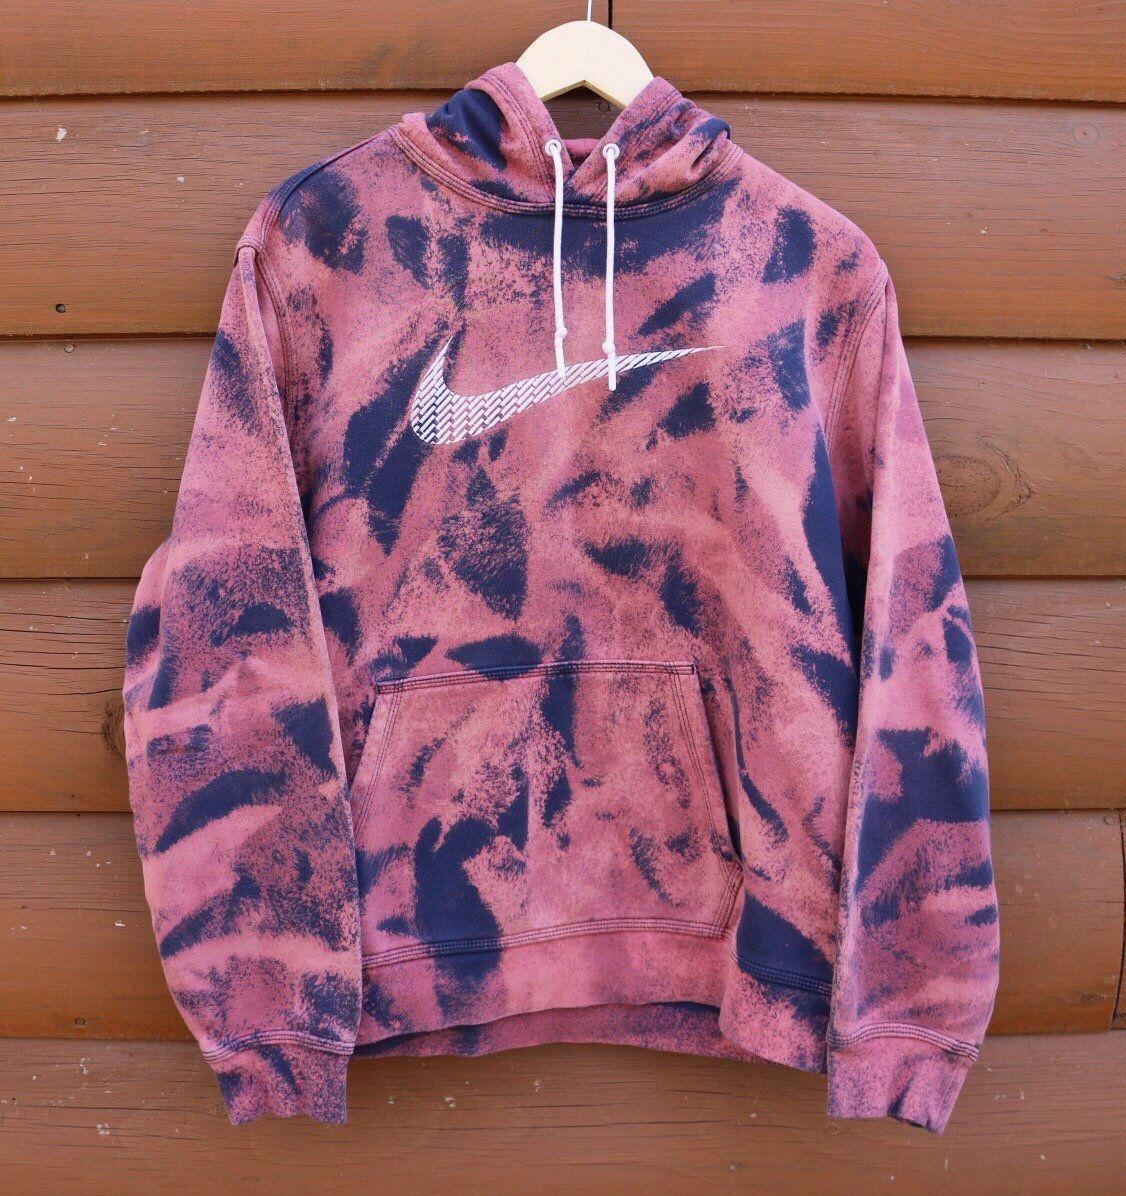 485b08310087 Nike Hoodie Custom Bleached Purple Pink and Blue Acid Wash Sweatshirt by  ScarlettThreadz on Etsy https